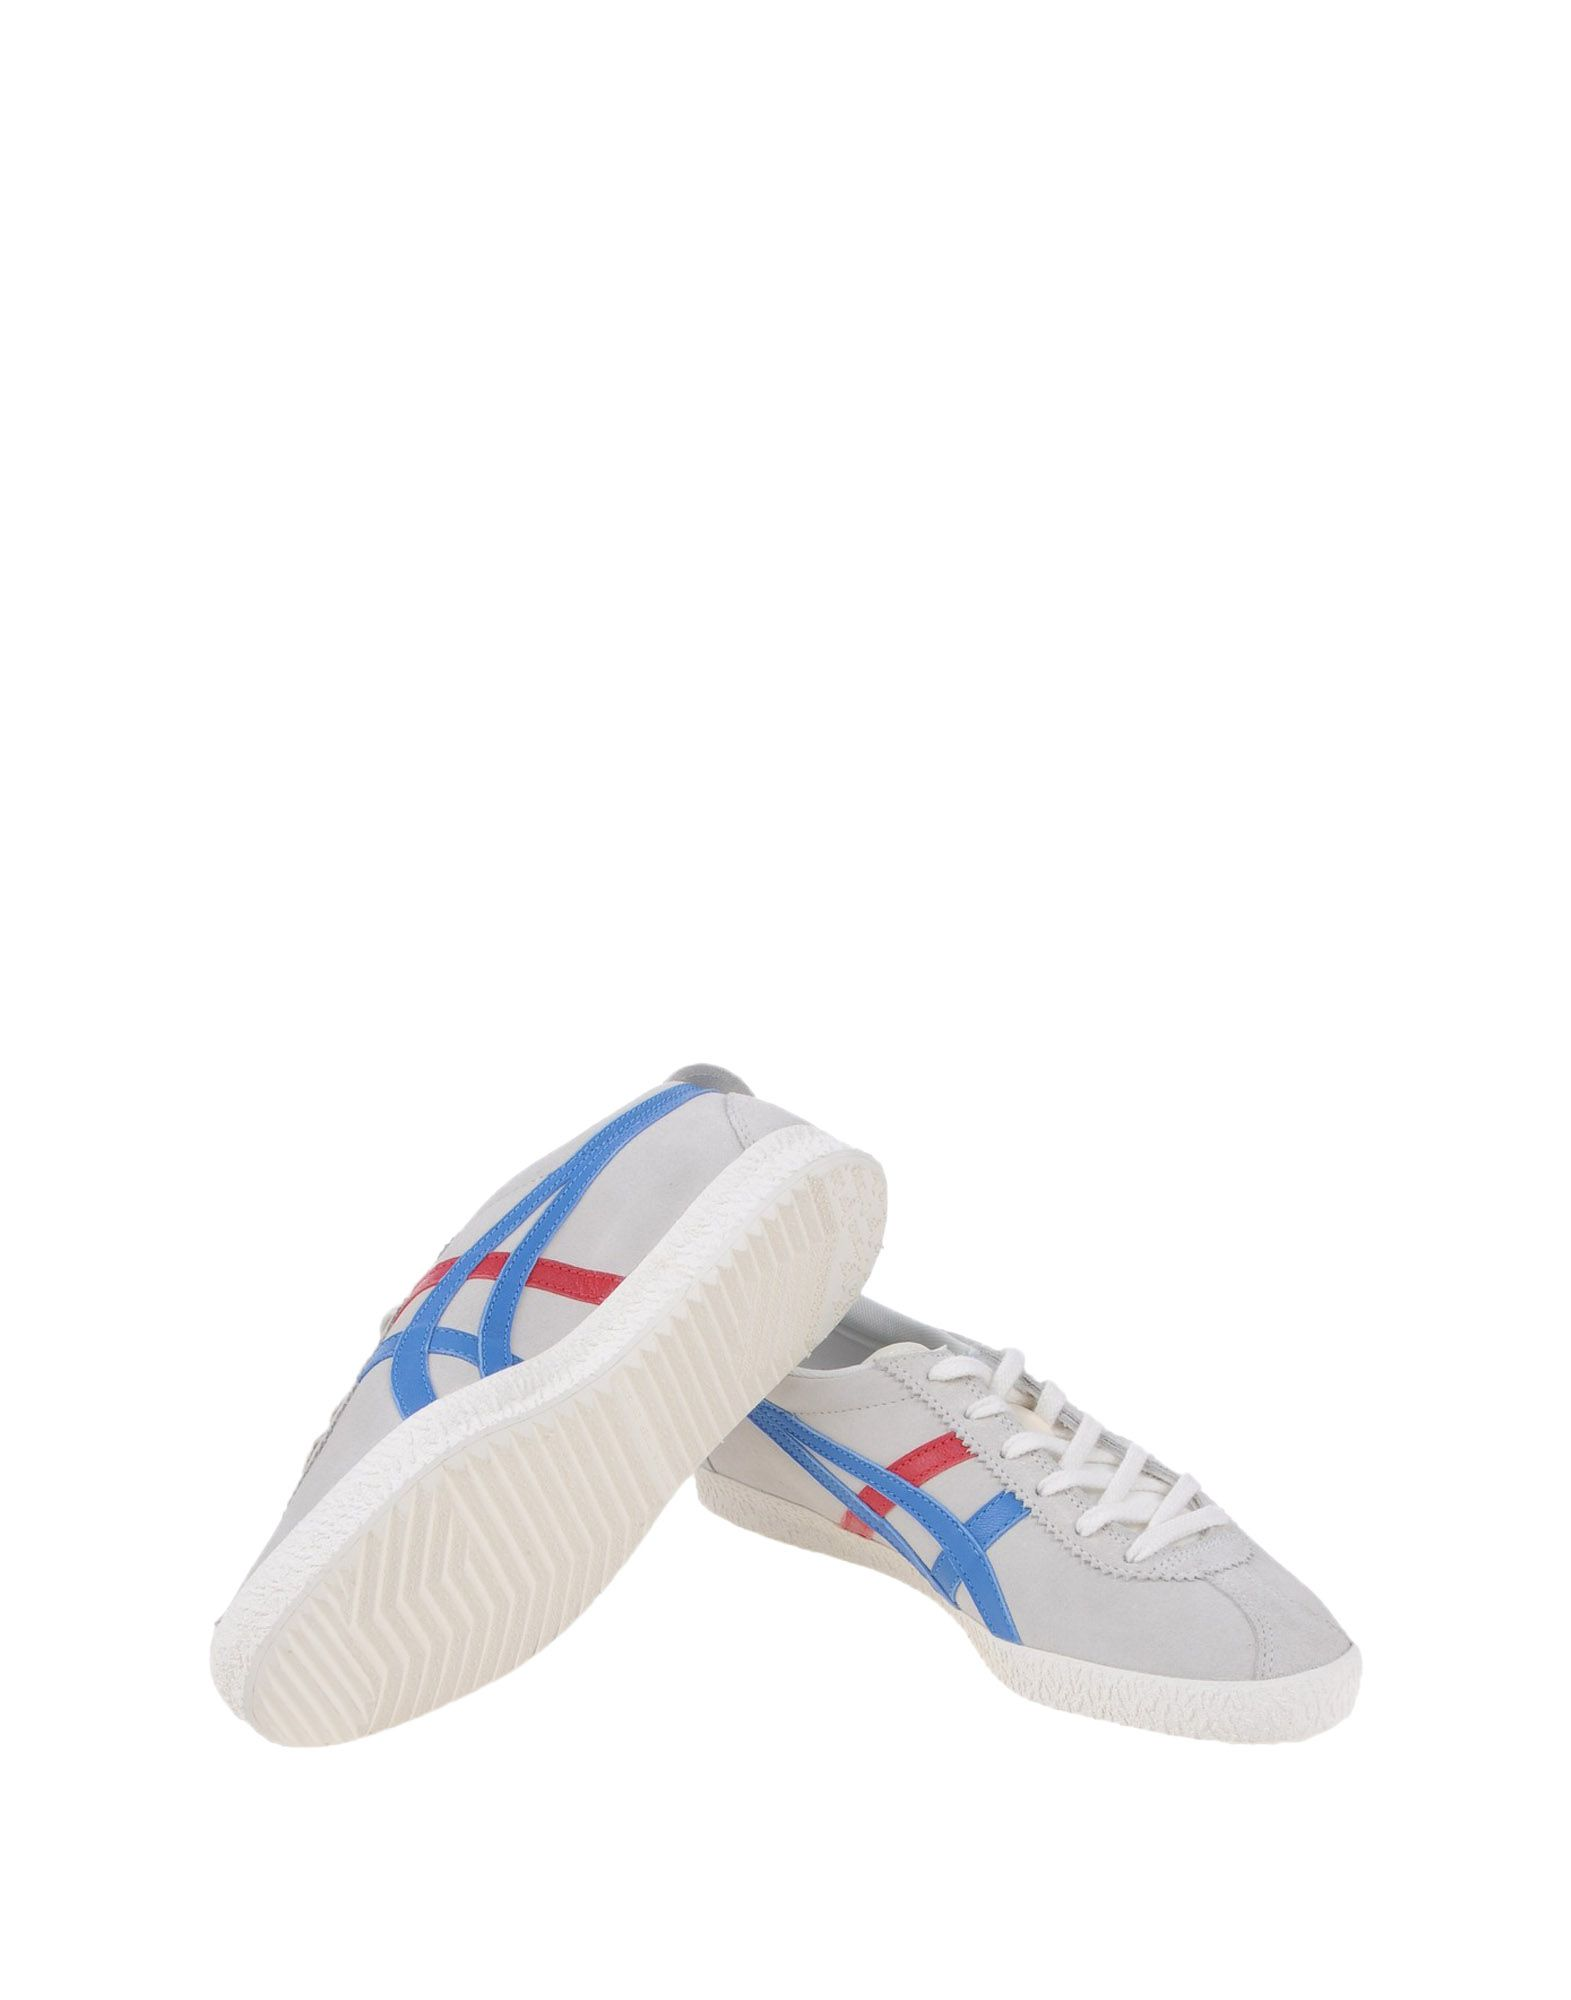 Onitsuka Tiger Mexico Delegation  Gute 11004636XT Gute  Qualität beliebte Schuhe 672d4f